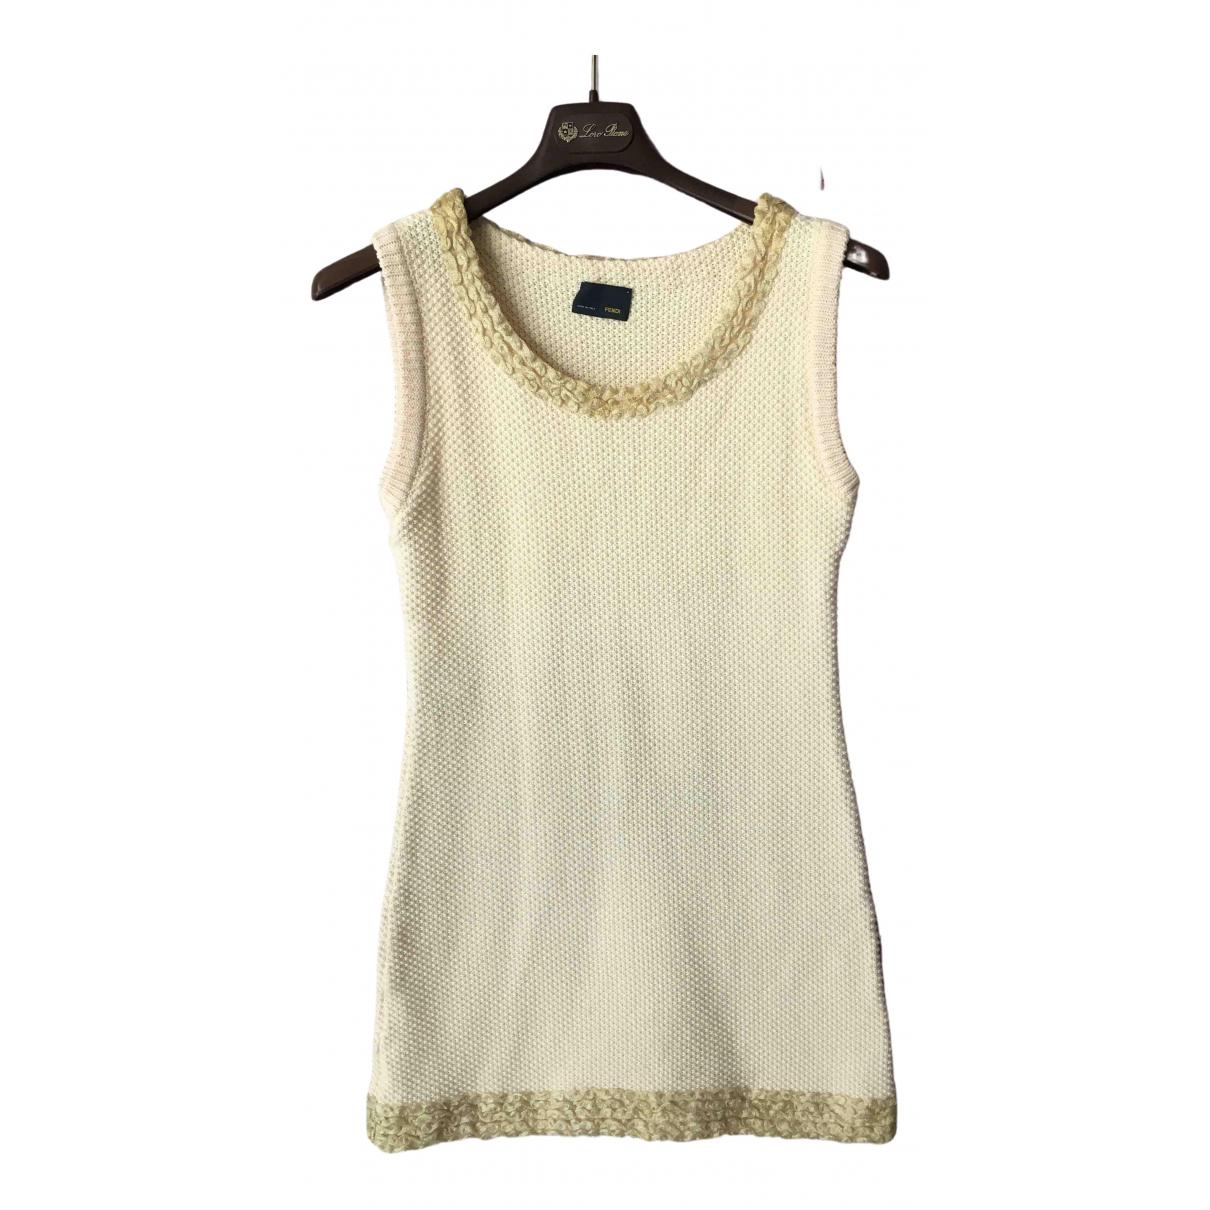 Fendi \N Ecru Cotton dress for Women S International